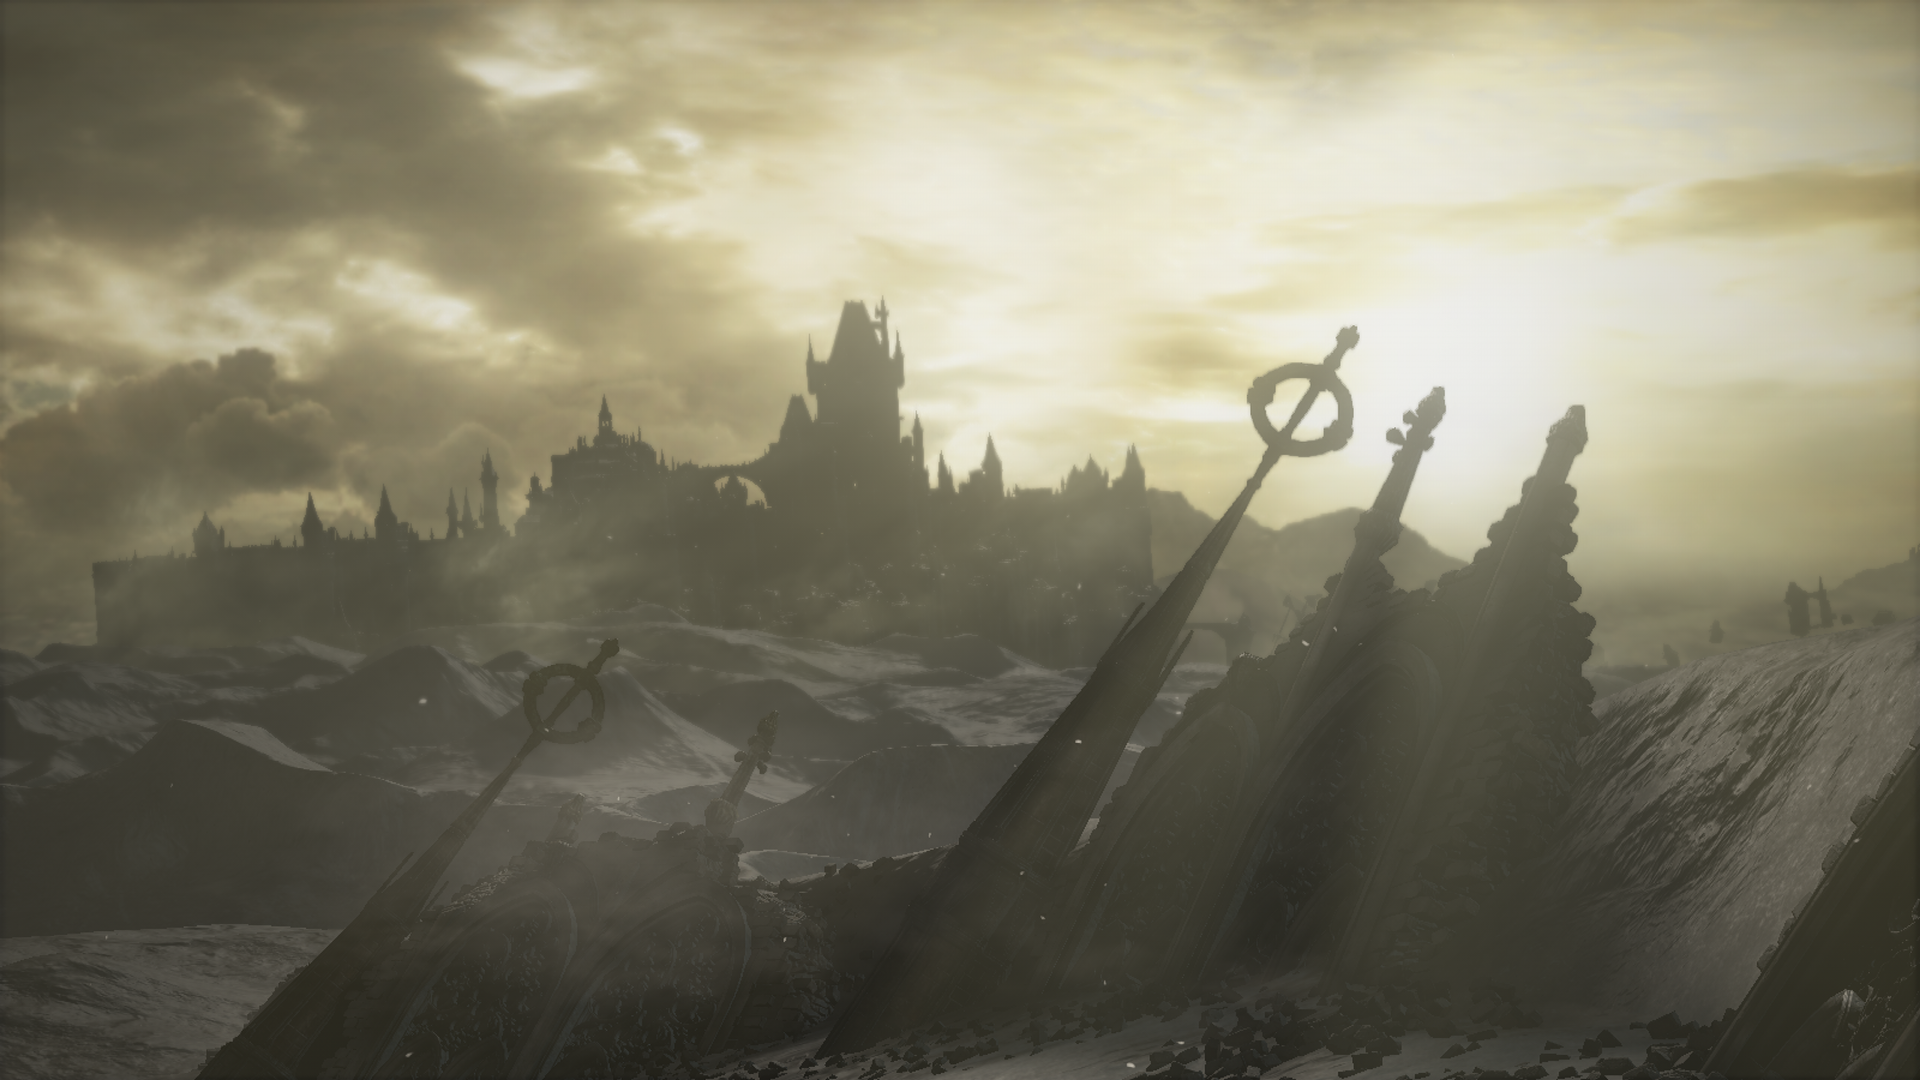 The Ringed City Wallpaper: Dark Souls 3 The Ringed City By Bartock26 On DeviantArt